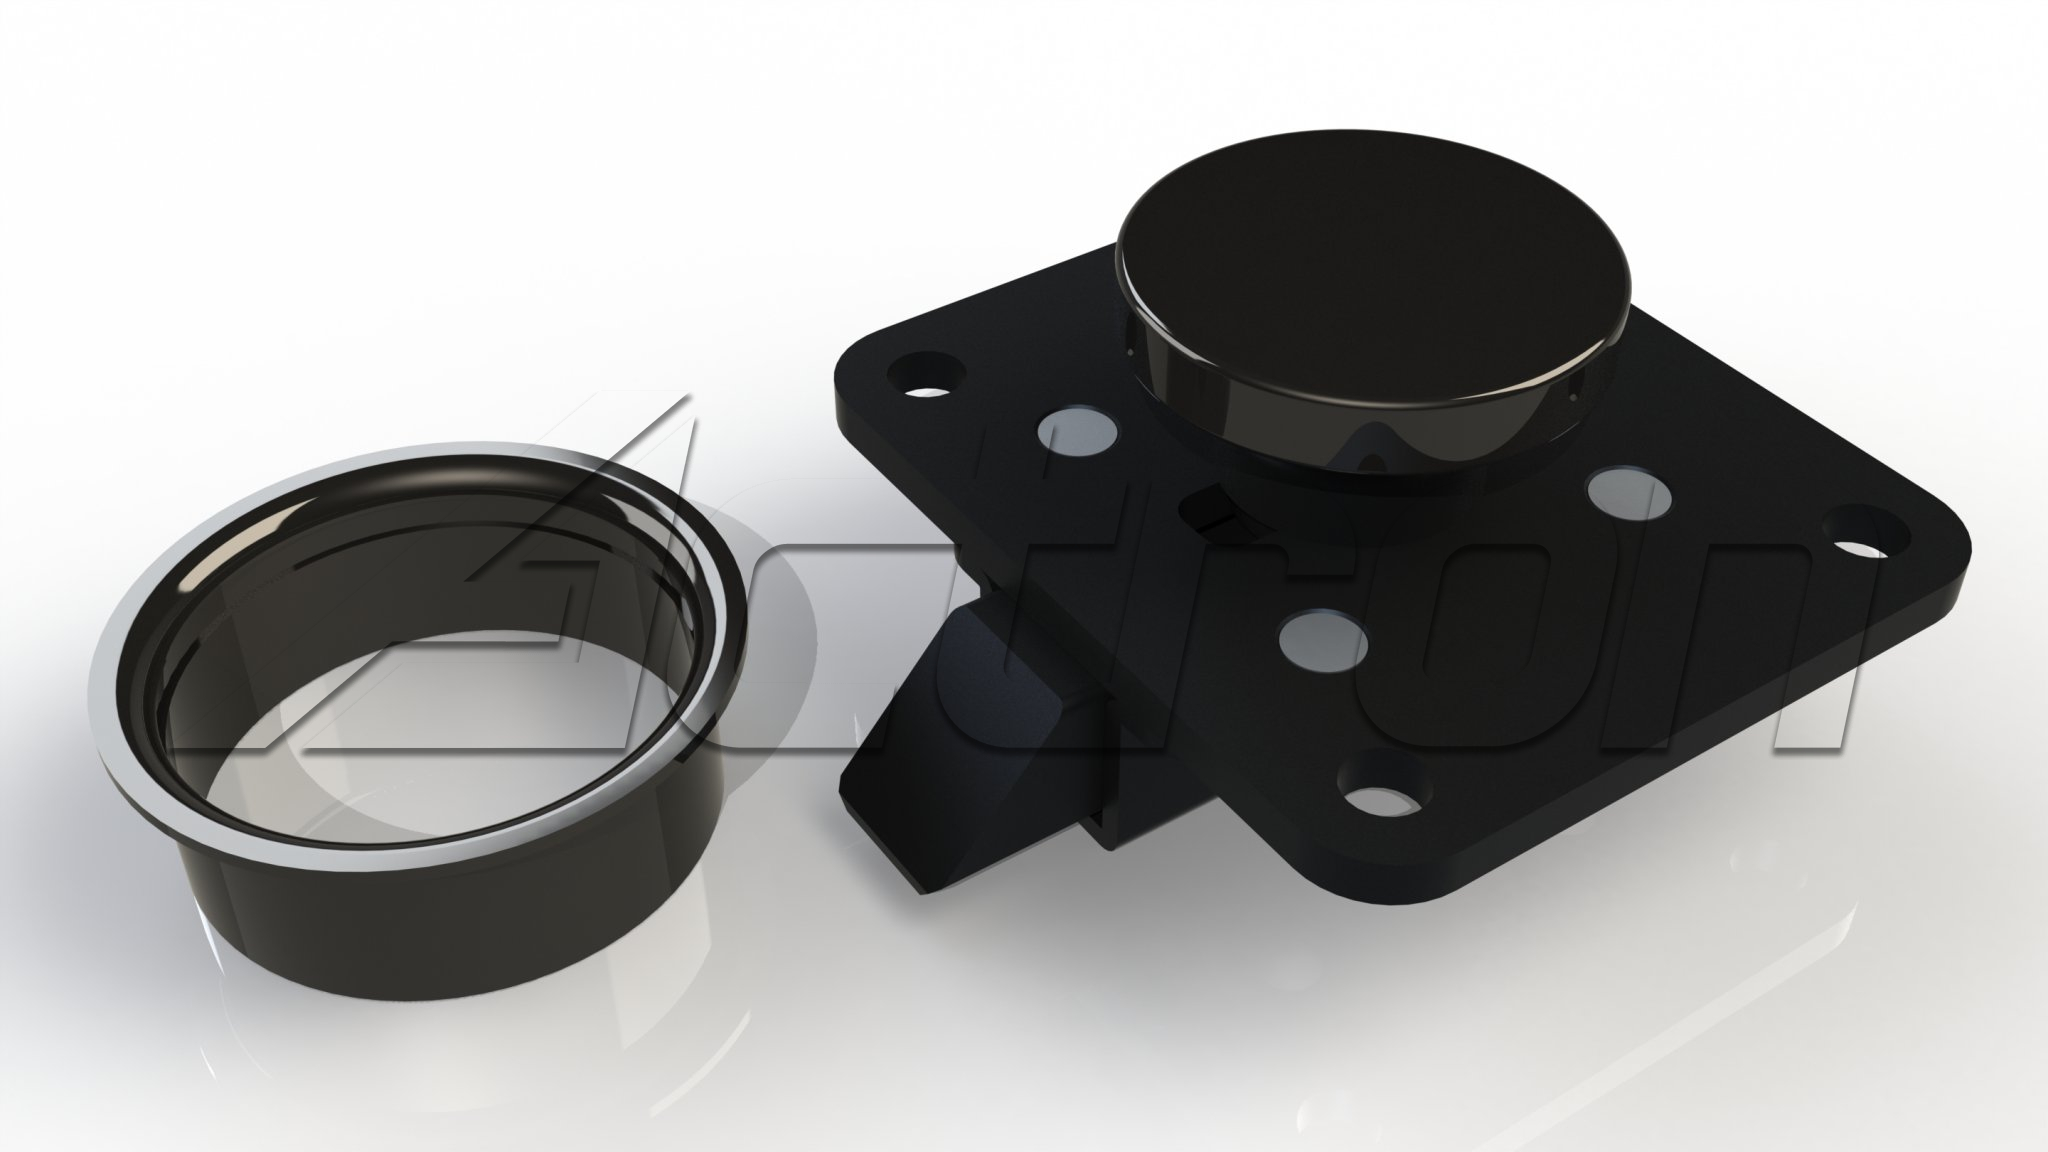 latch-assy-8211-push-button-5510-a30039.jpg